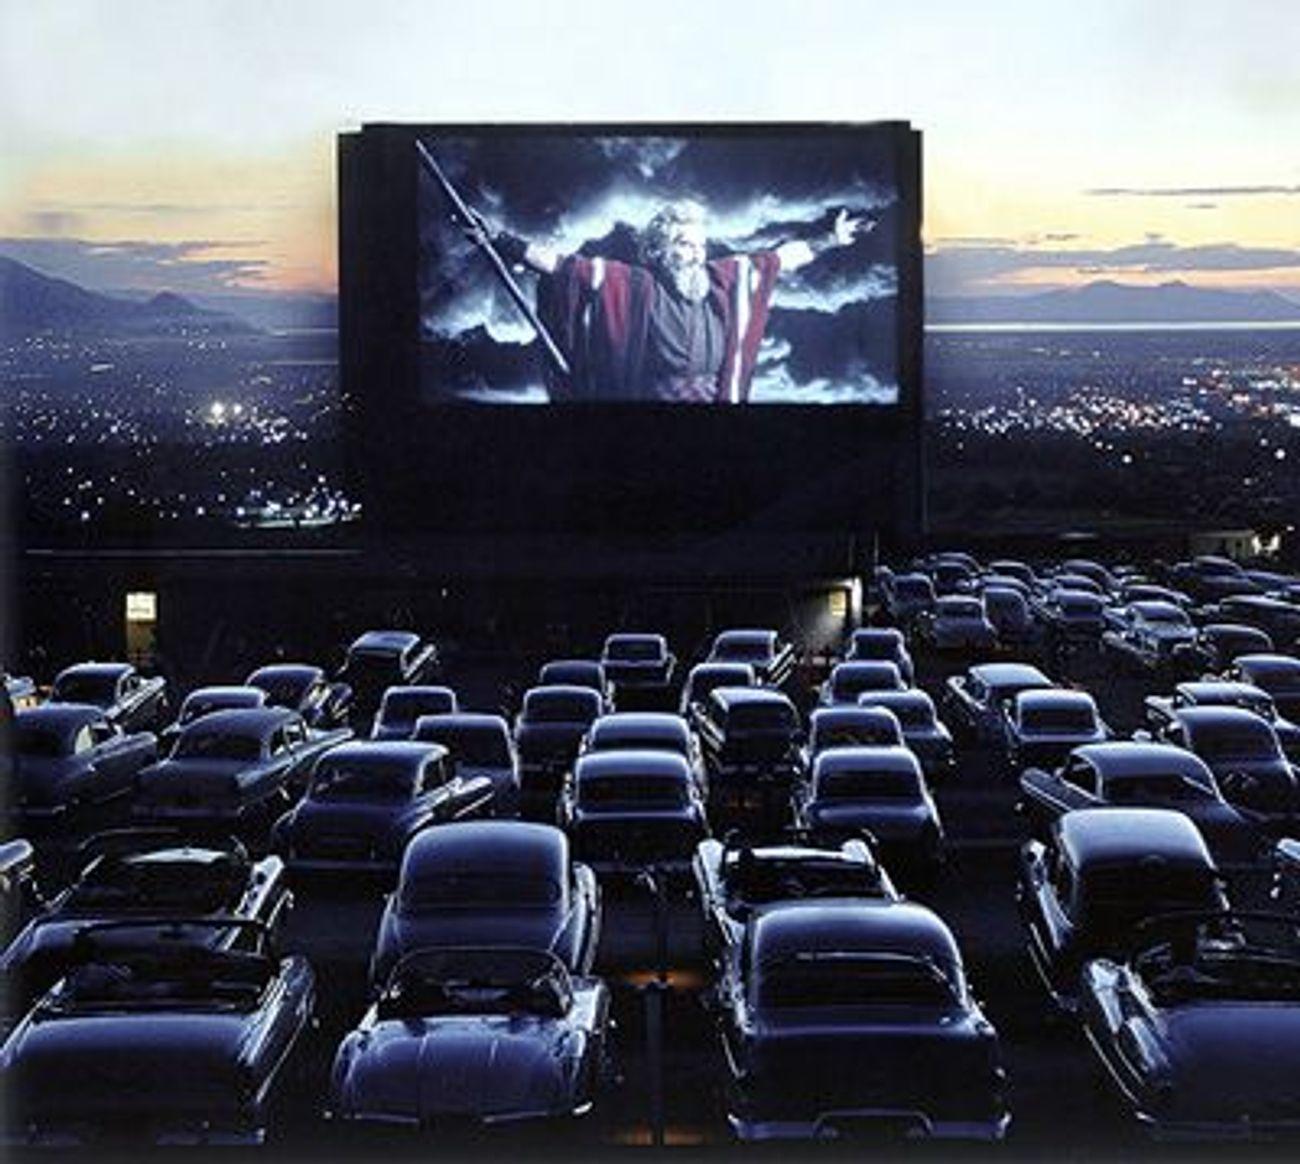 Eind oktober, Drive-in Movie in Zaandam Moses-052809-1425724119